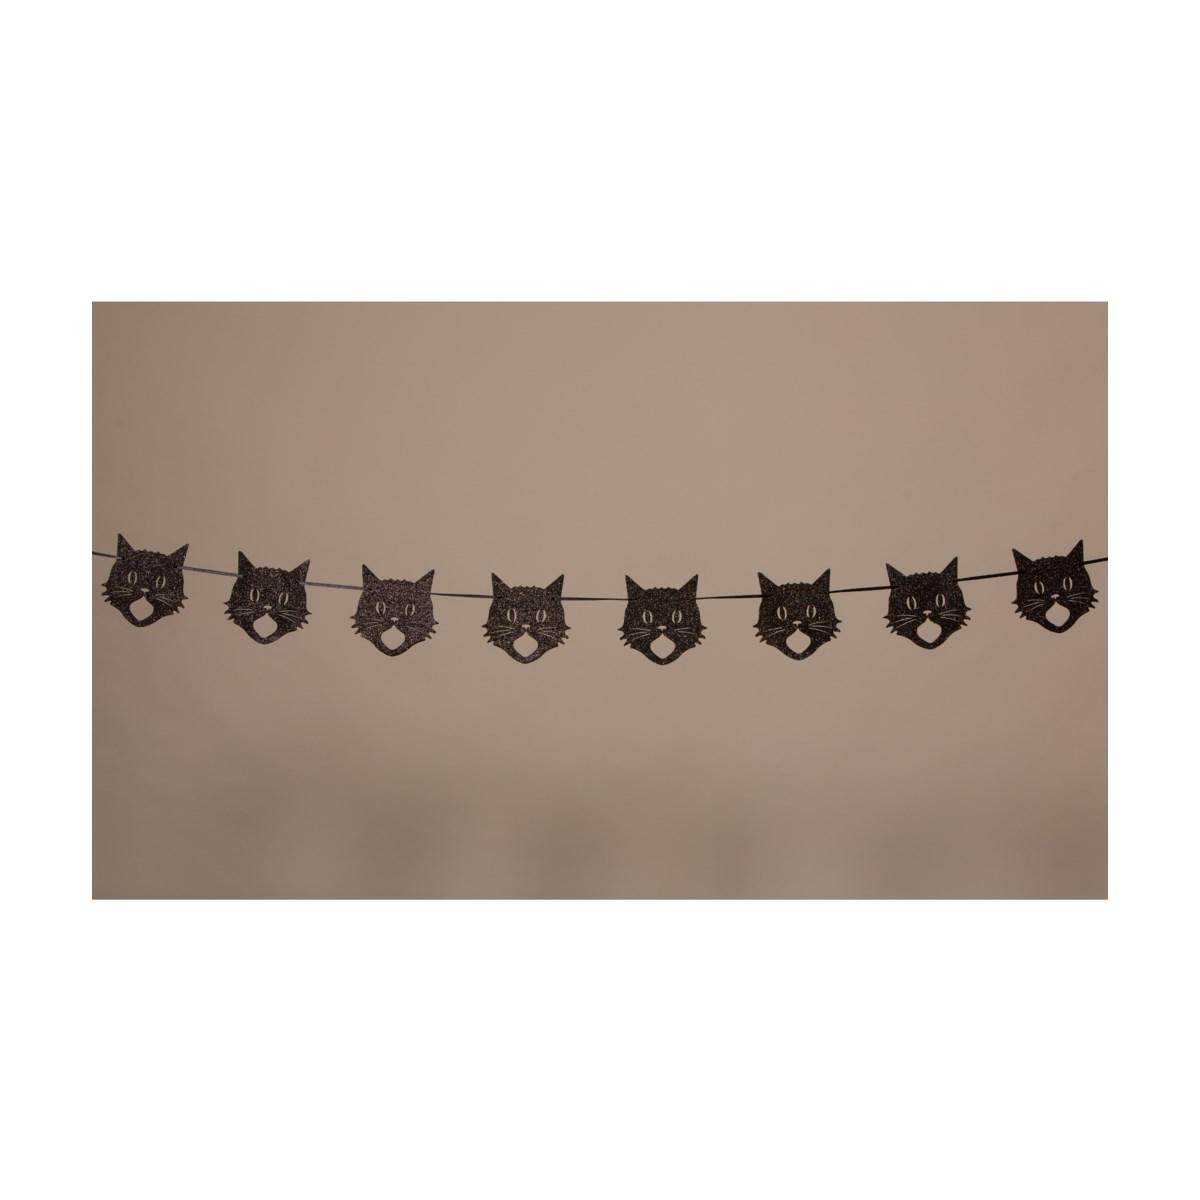 Glittered Scaredy Cat Silhouette Garland